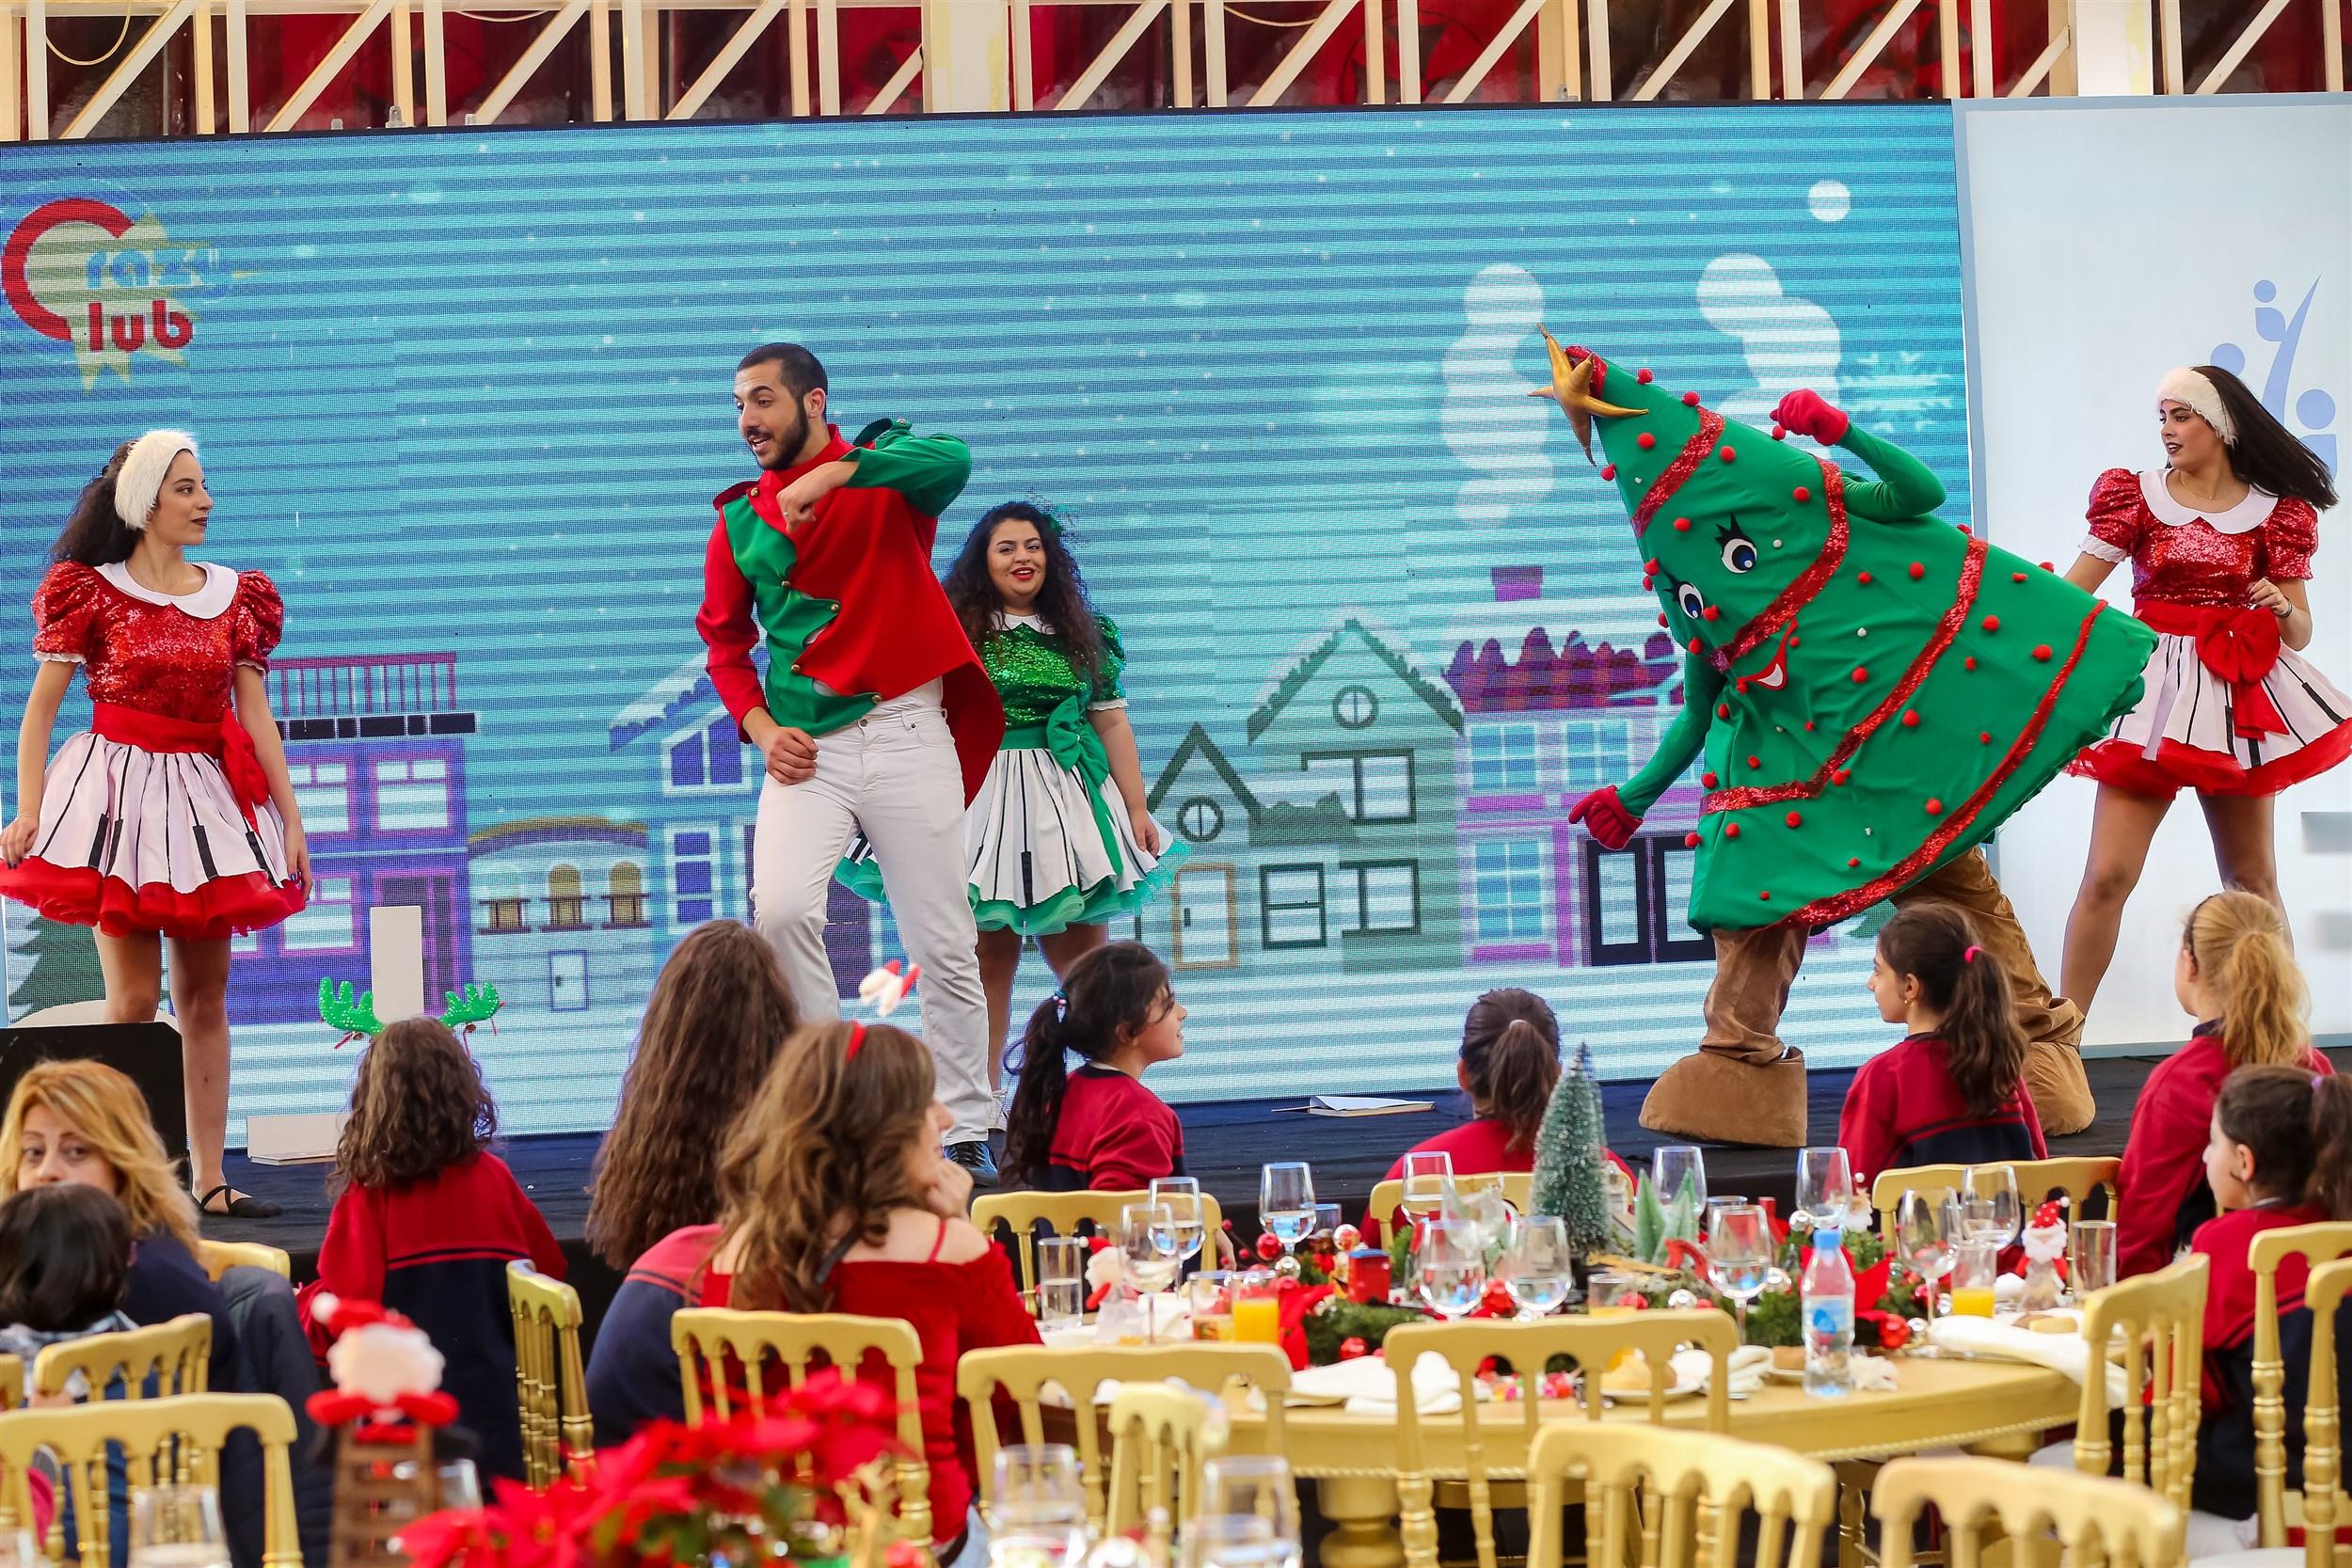 the children enjoy the fun filled festive show.